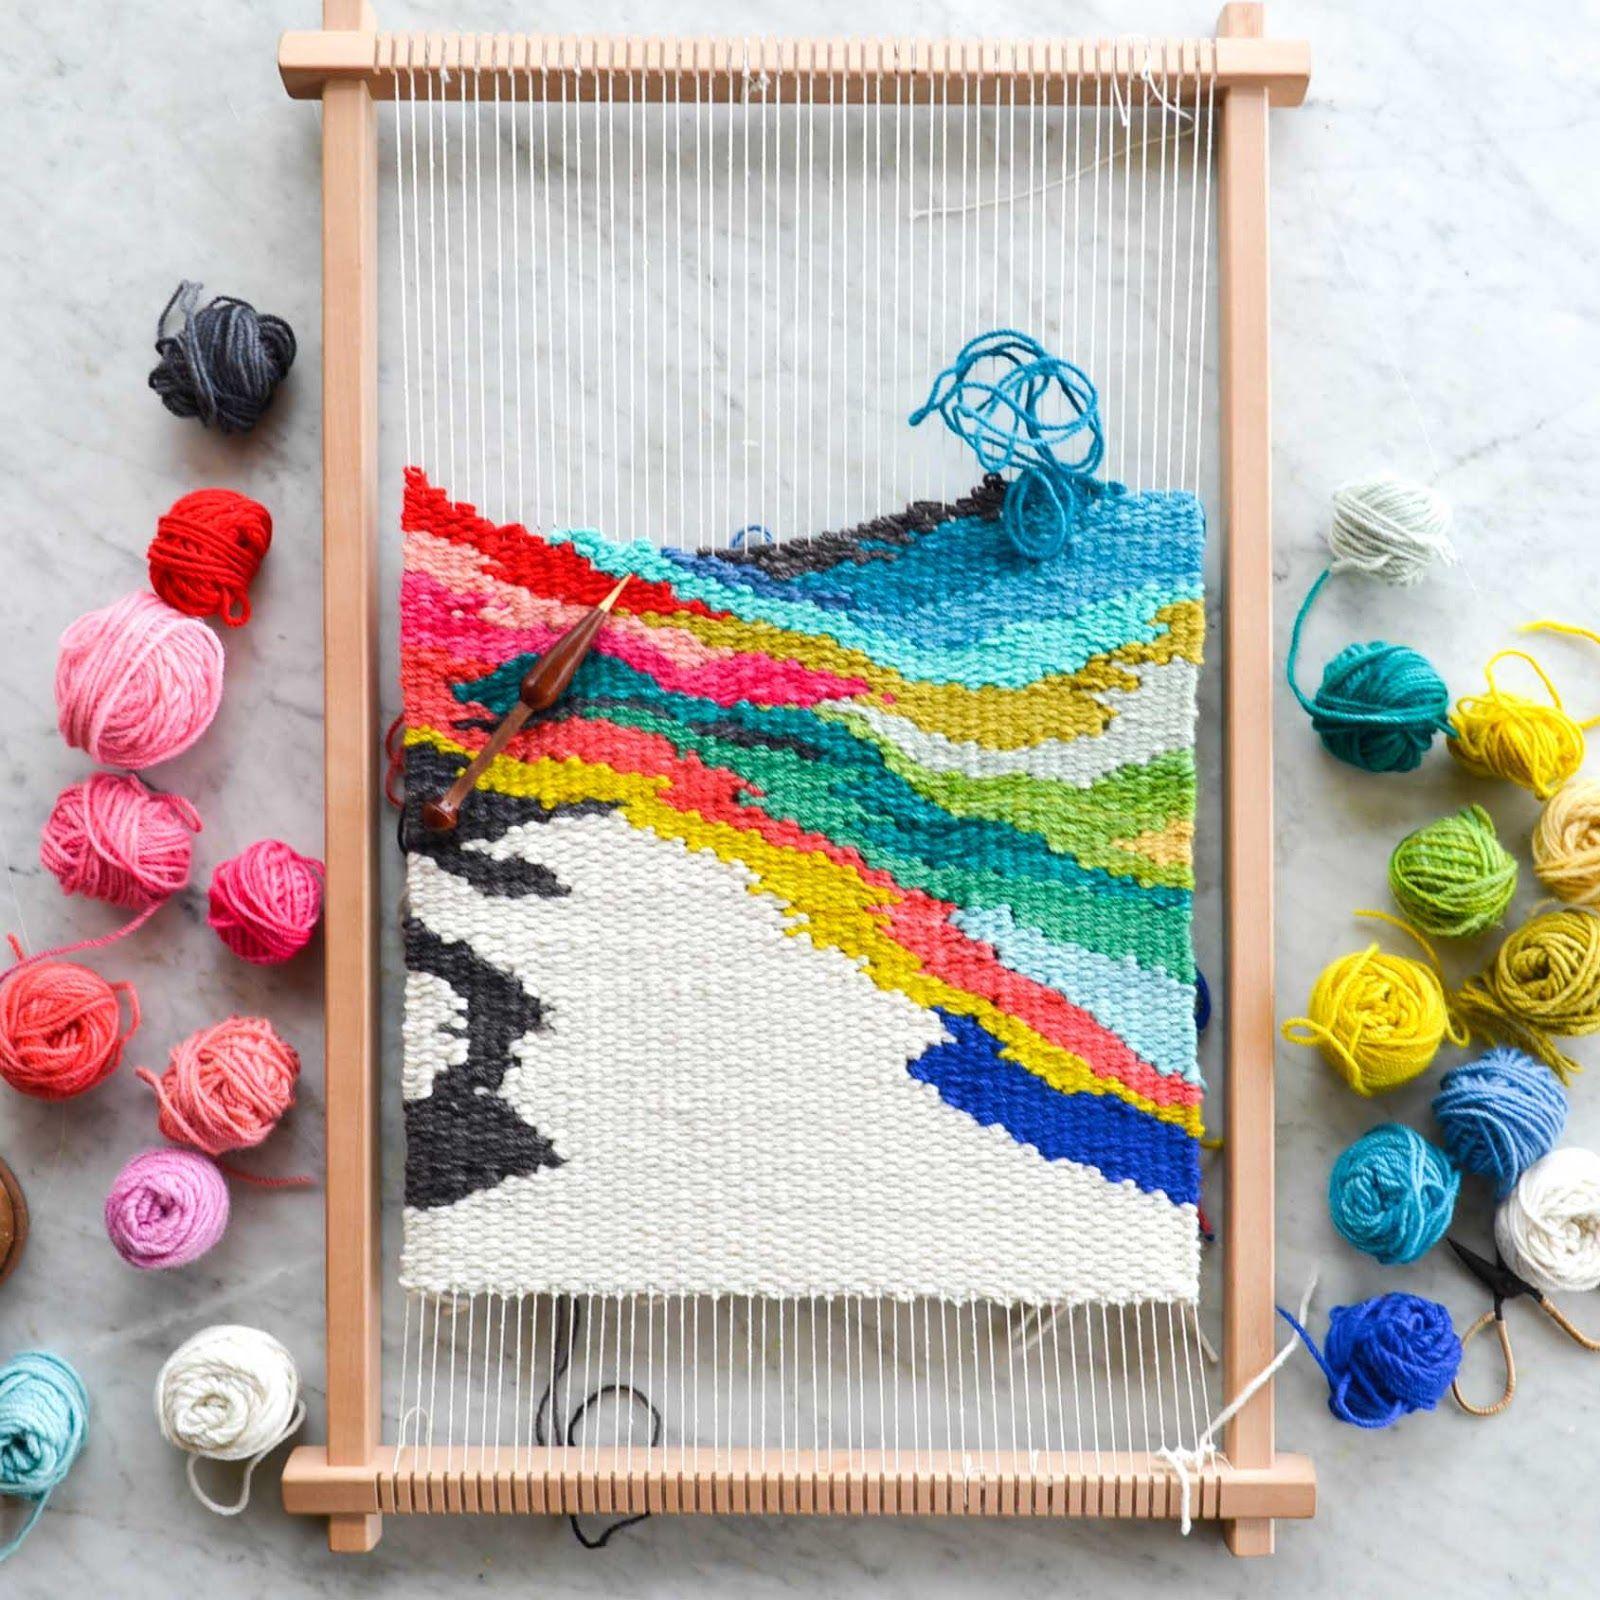 """tapestry Weaving Unique Art Form. Loom"